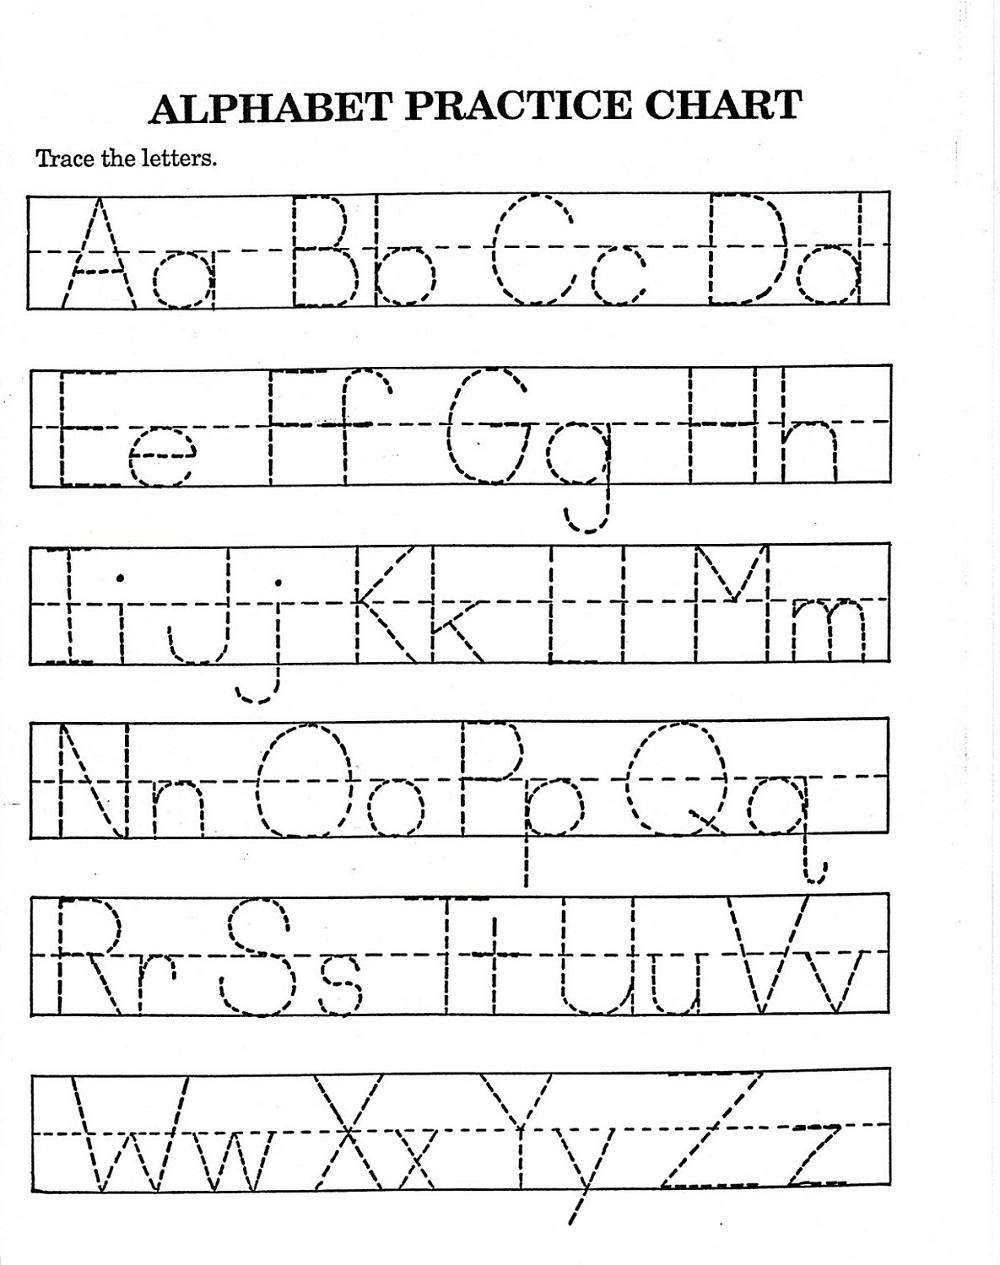 Traceable Alphabet Worksheets A-Z | Activity Shelter pertaining to A-Z Alphabet Tracing Worksheets